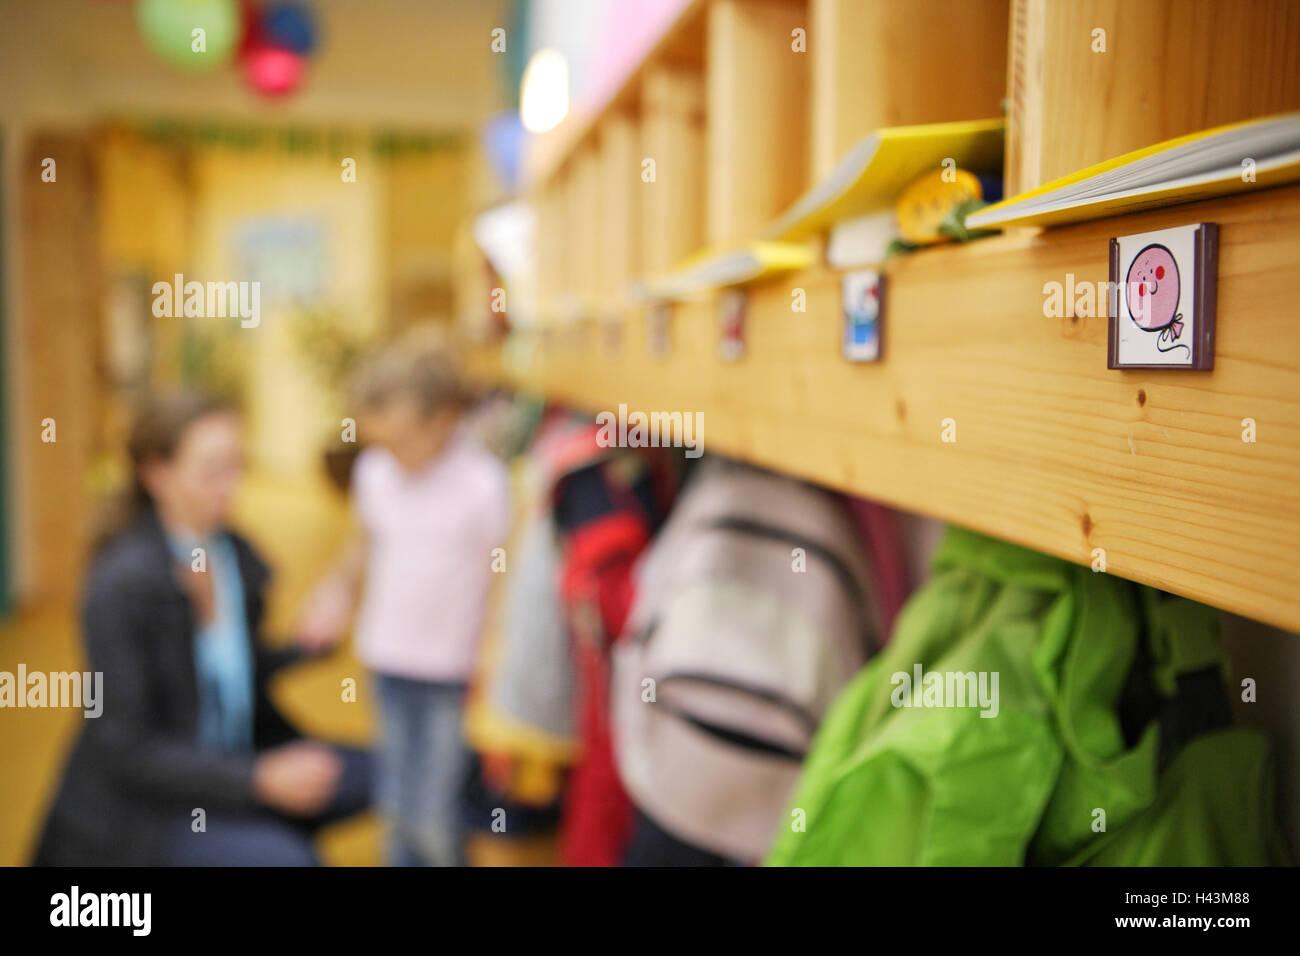 Kindergarten, Garderobe, Mutter, Tochter, Unschärfe, Person, Frau ...